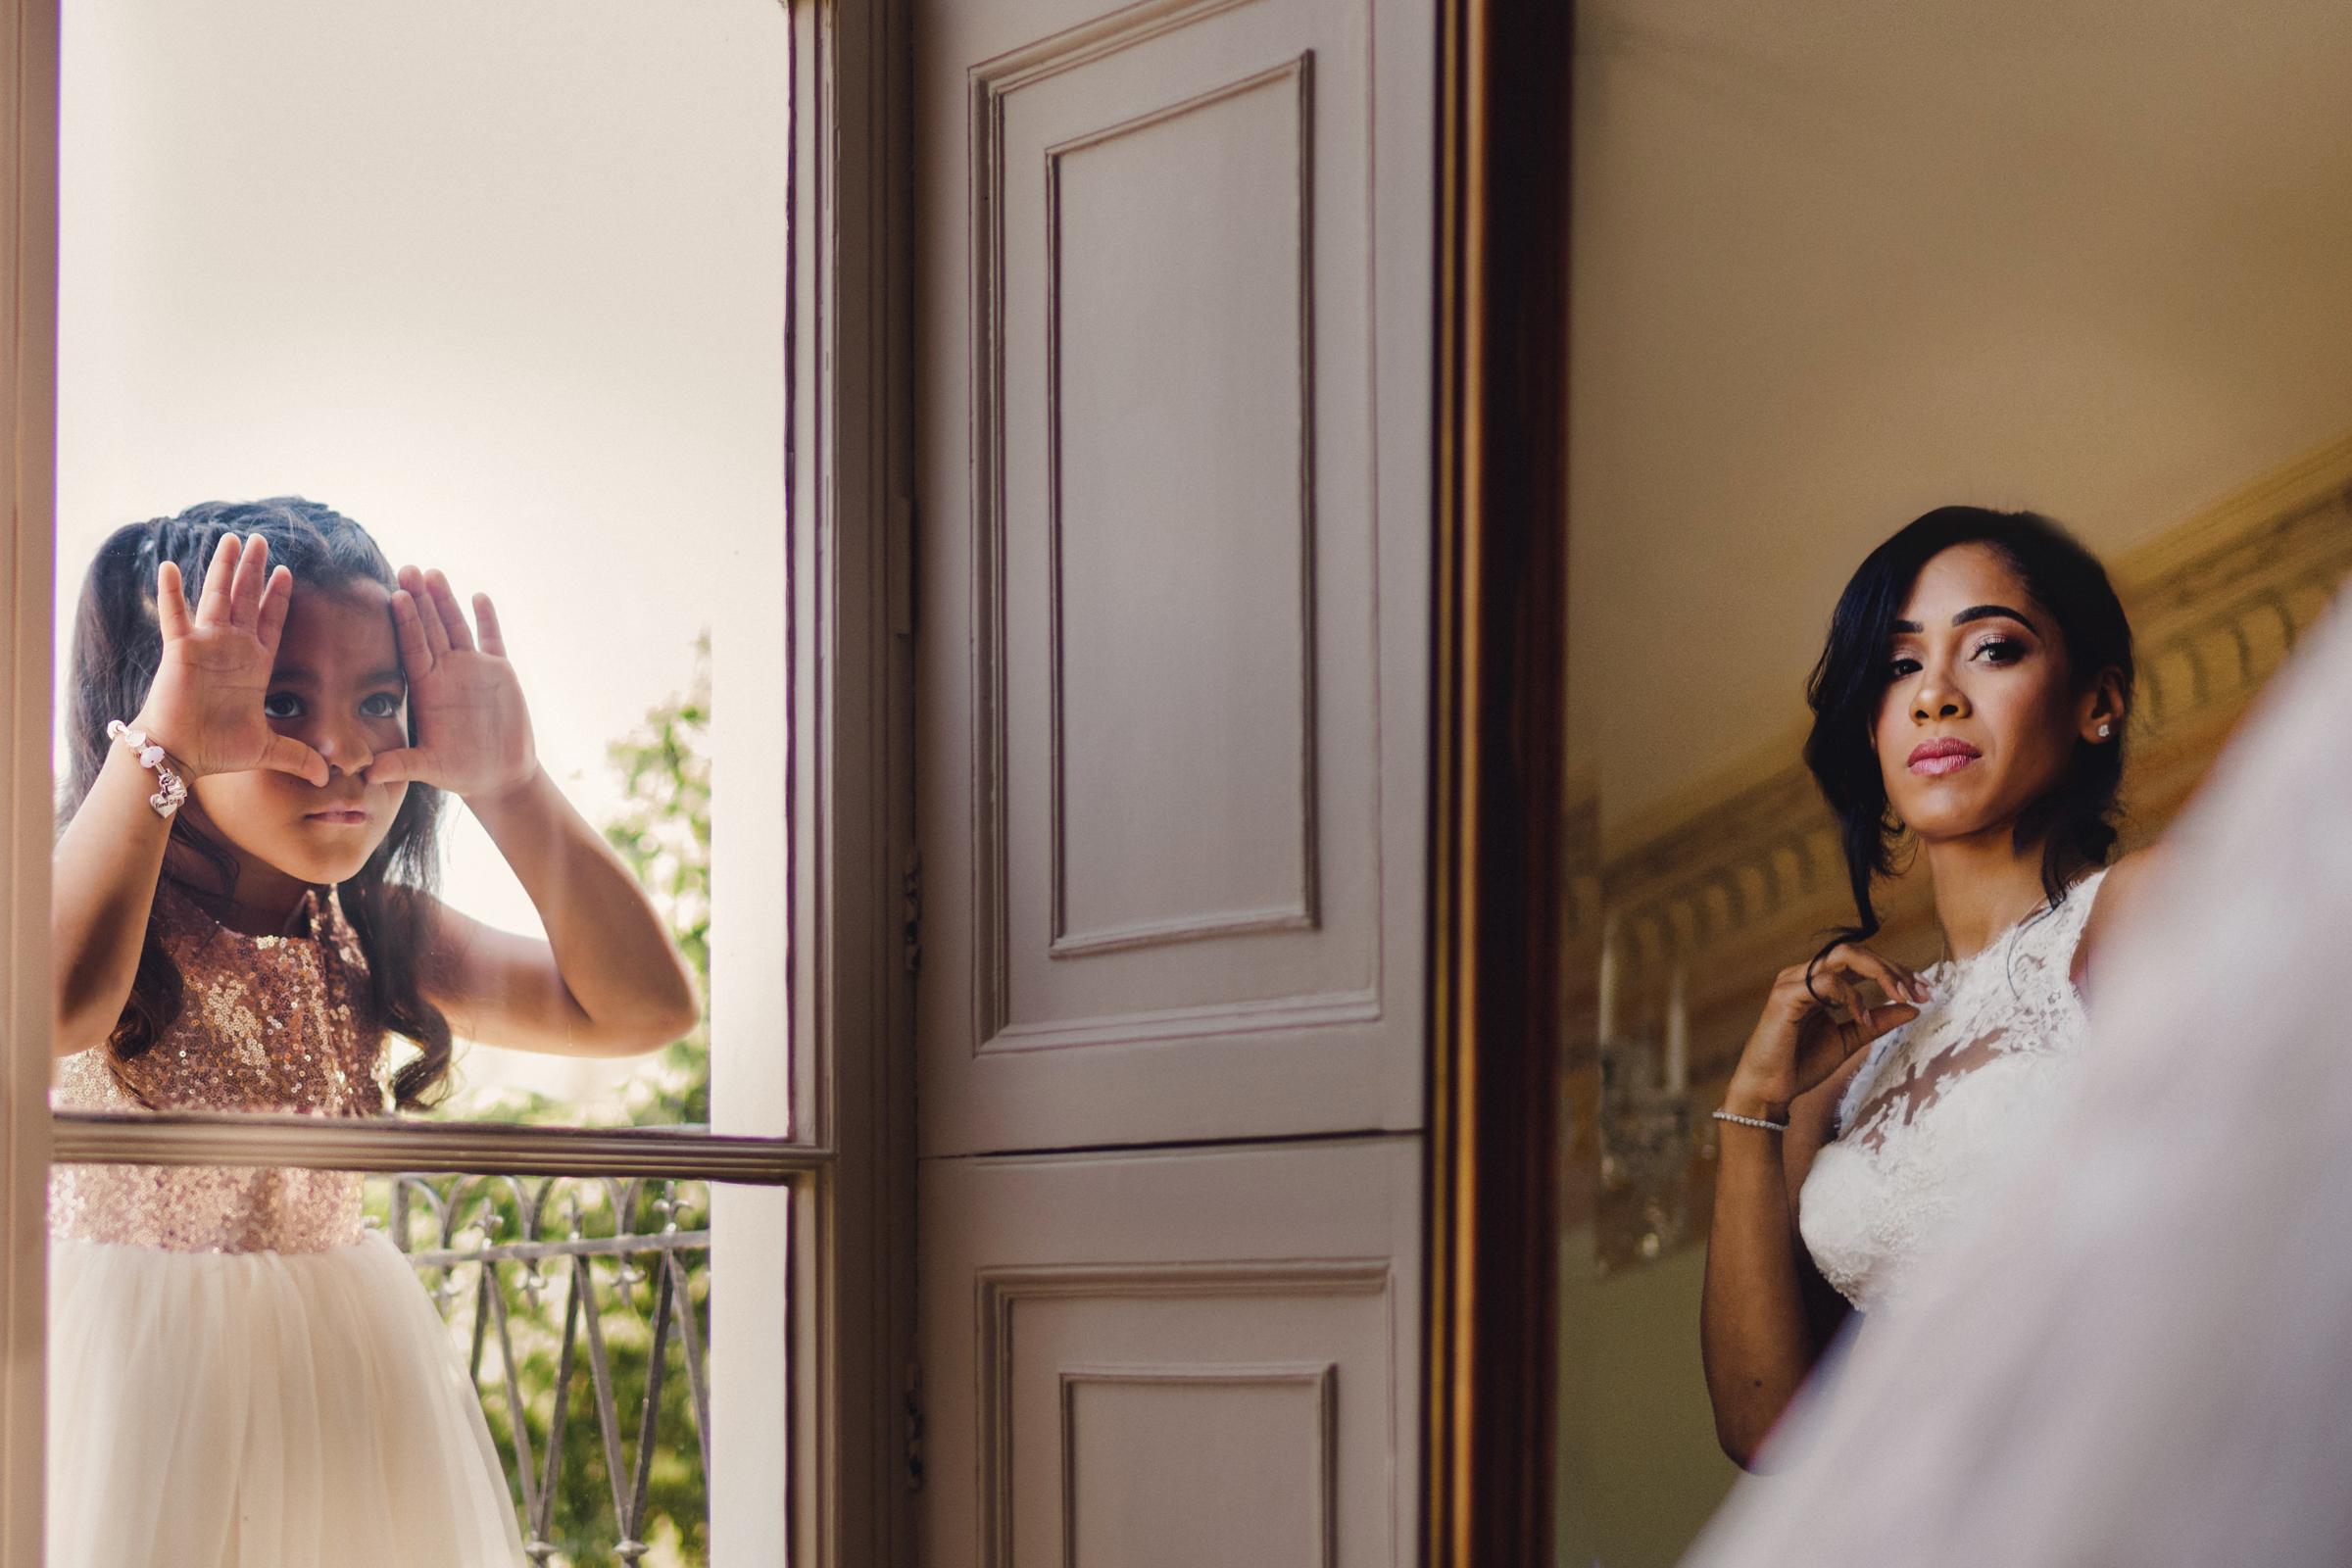 Flower girl peering in glass door at bride - photo by MIKI Studios